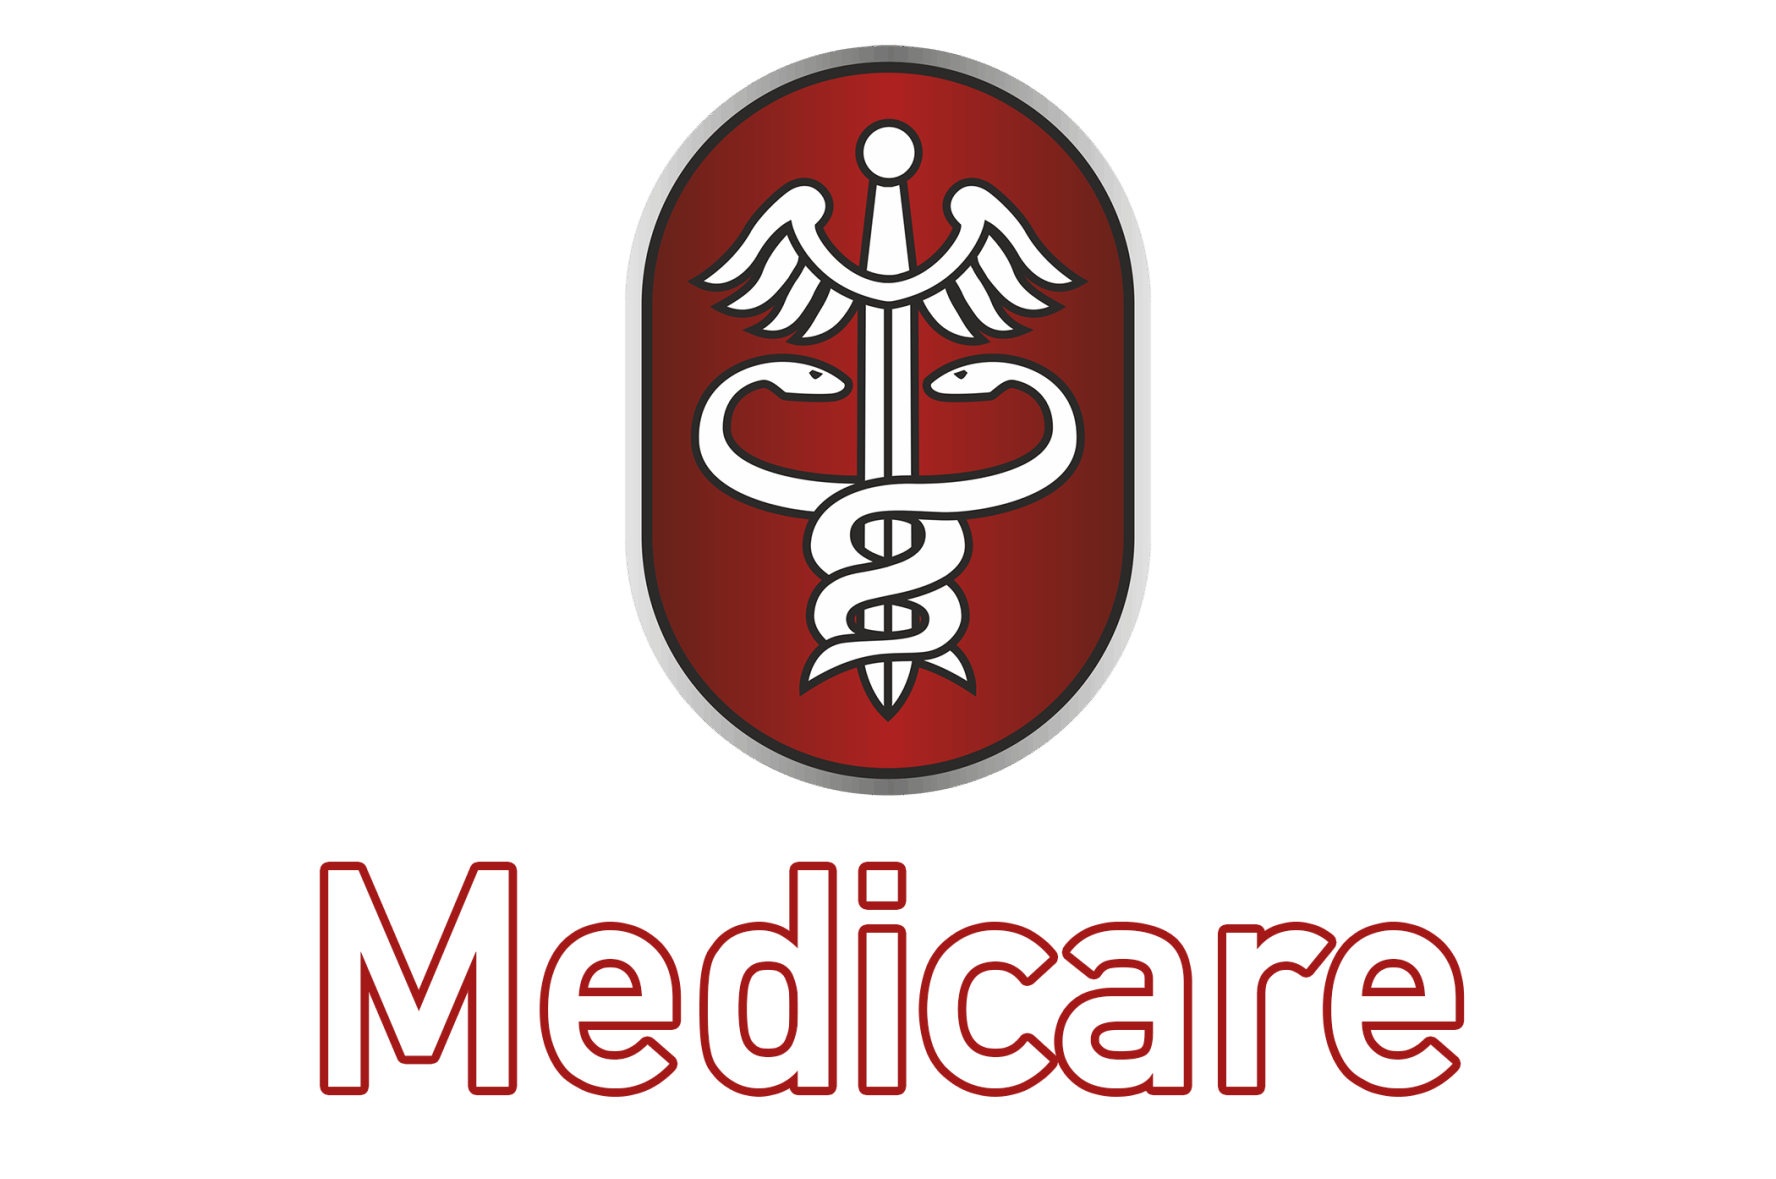 Medicare Ambulanter Pflegedienst GmbH